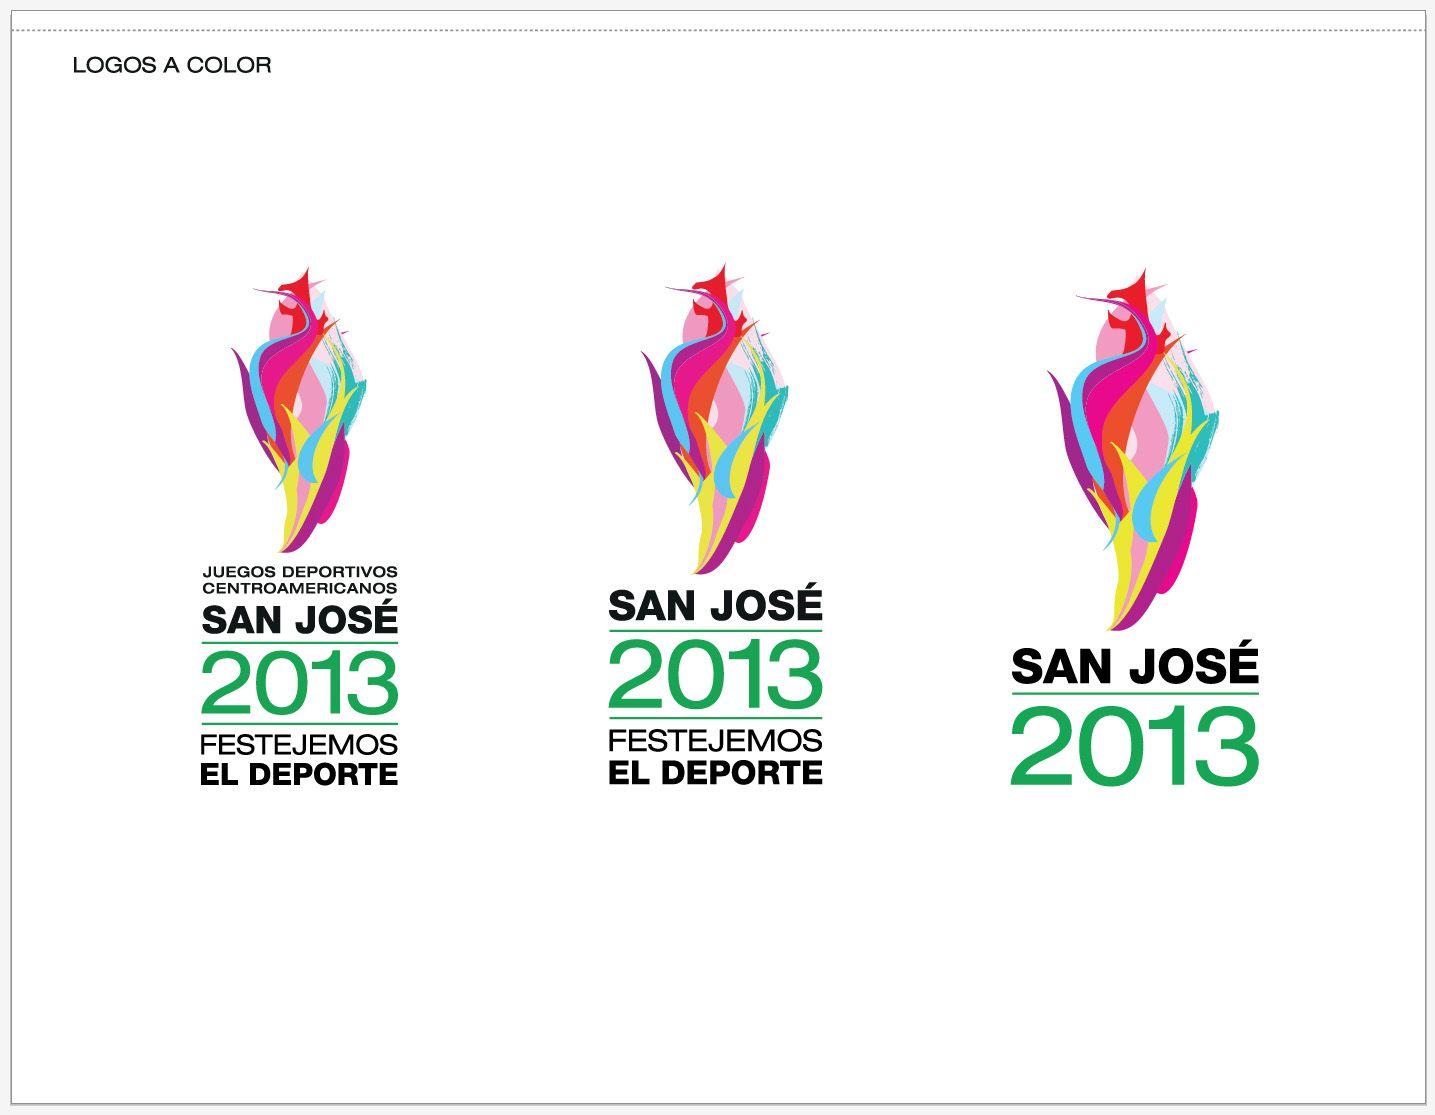 Logo Final Juegos Deportivos Centroamericanos San Jose 2013 Diseno